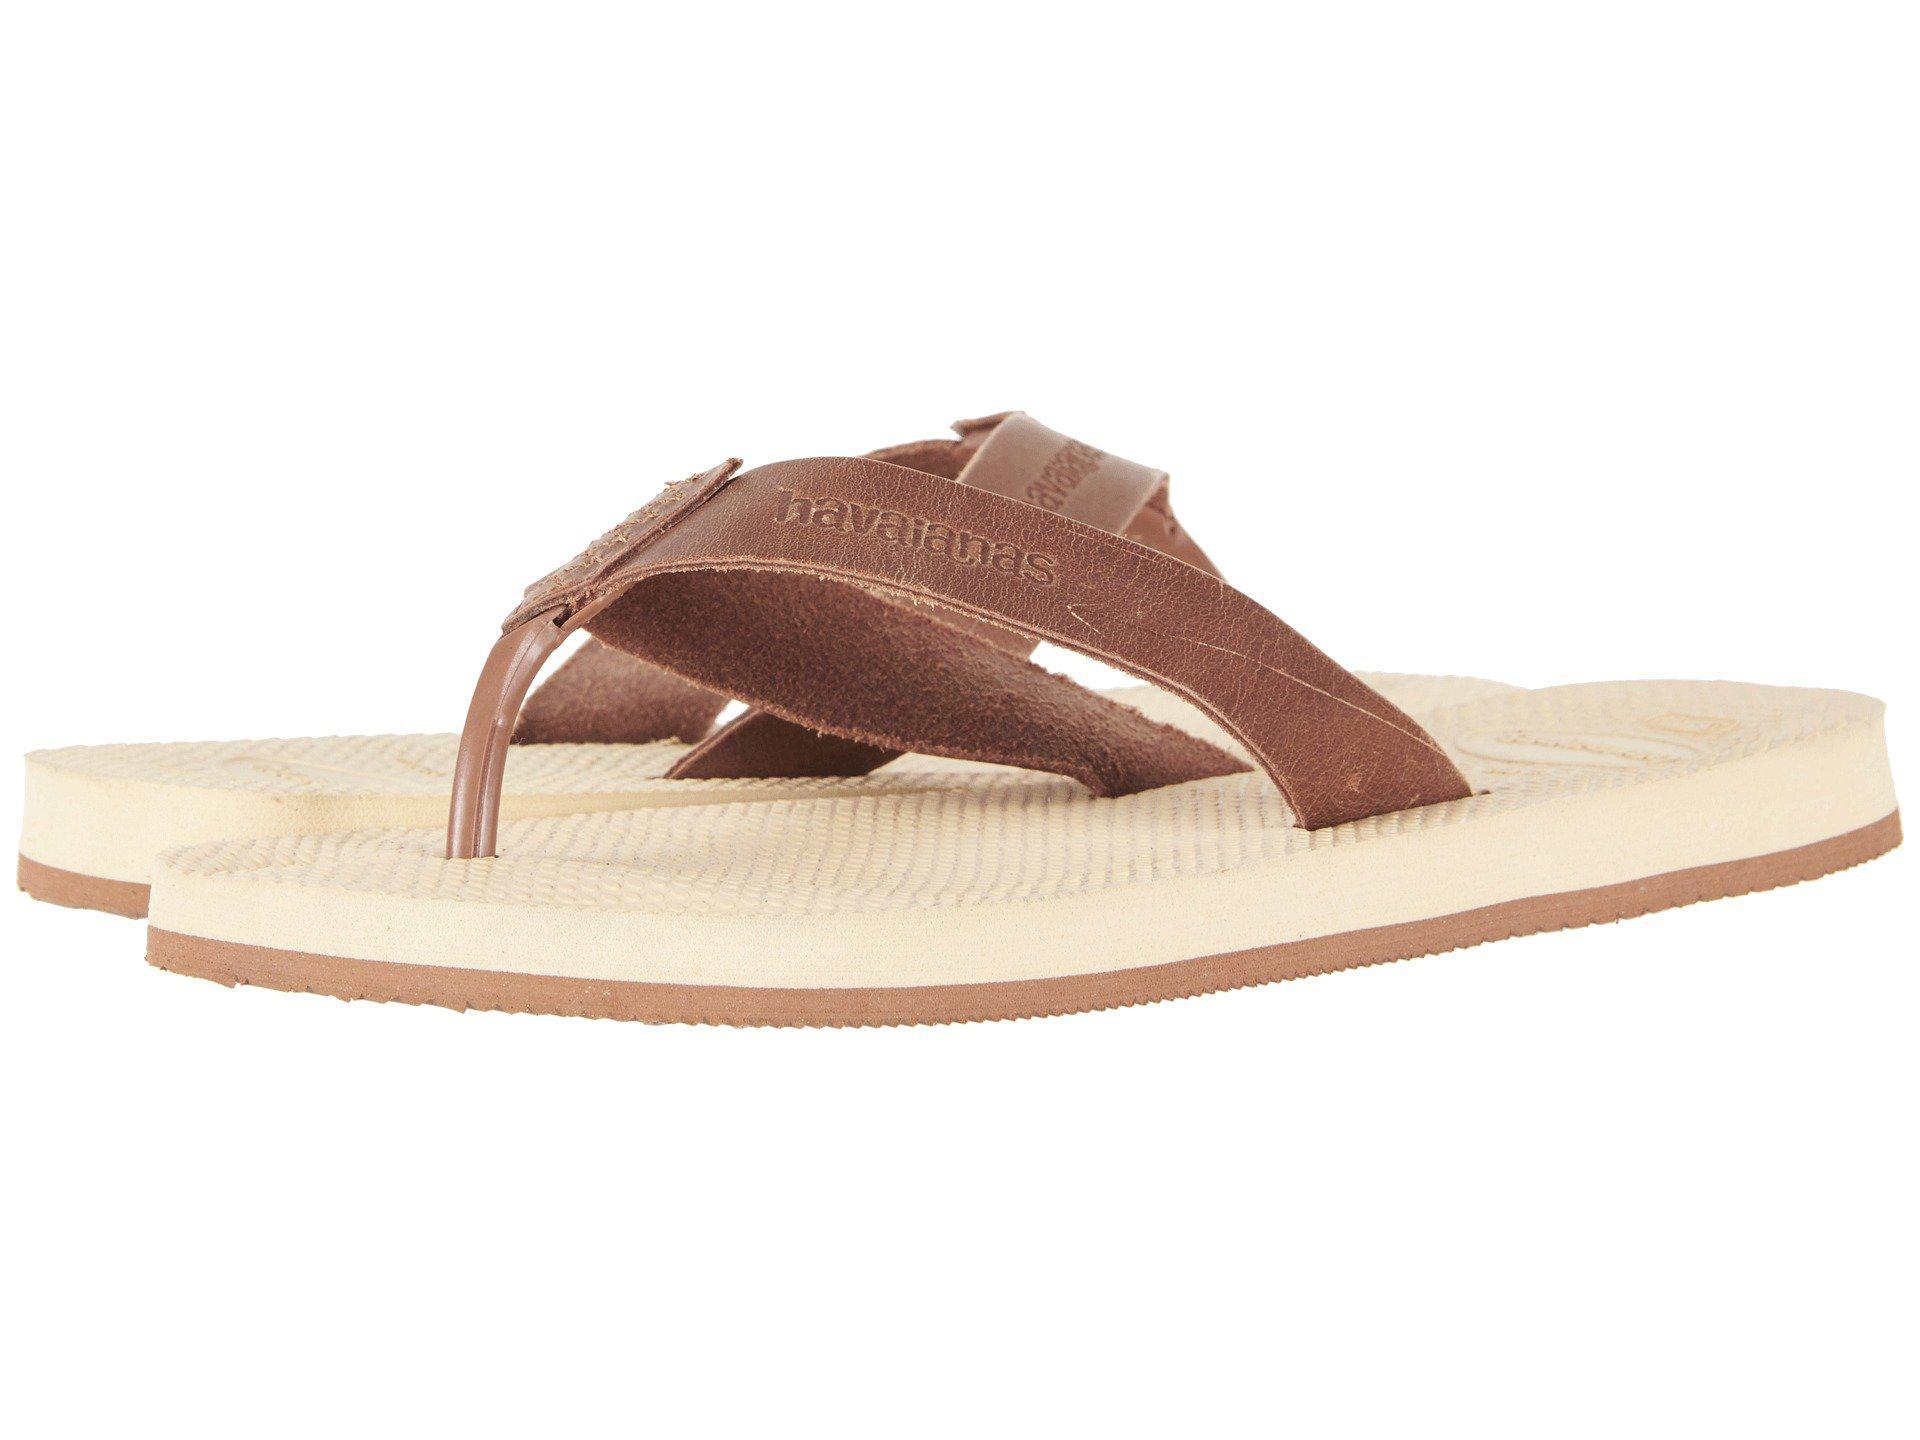 e0fbf7a5f Havaianas - White Urban Special Flip-flops (black) Men s Sandals for Men -.  View fullscreen